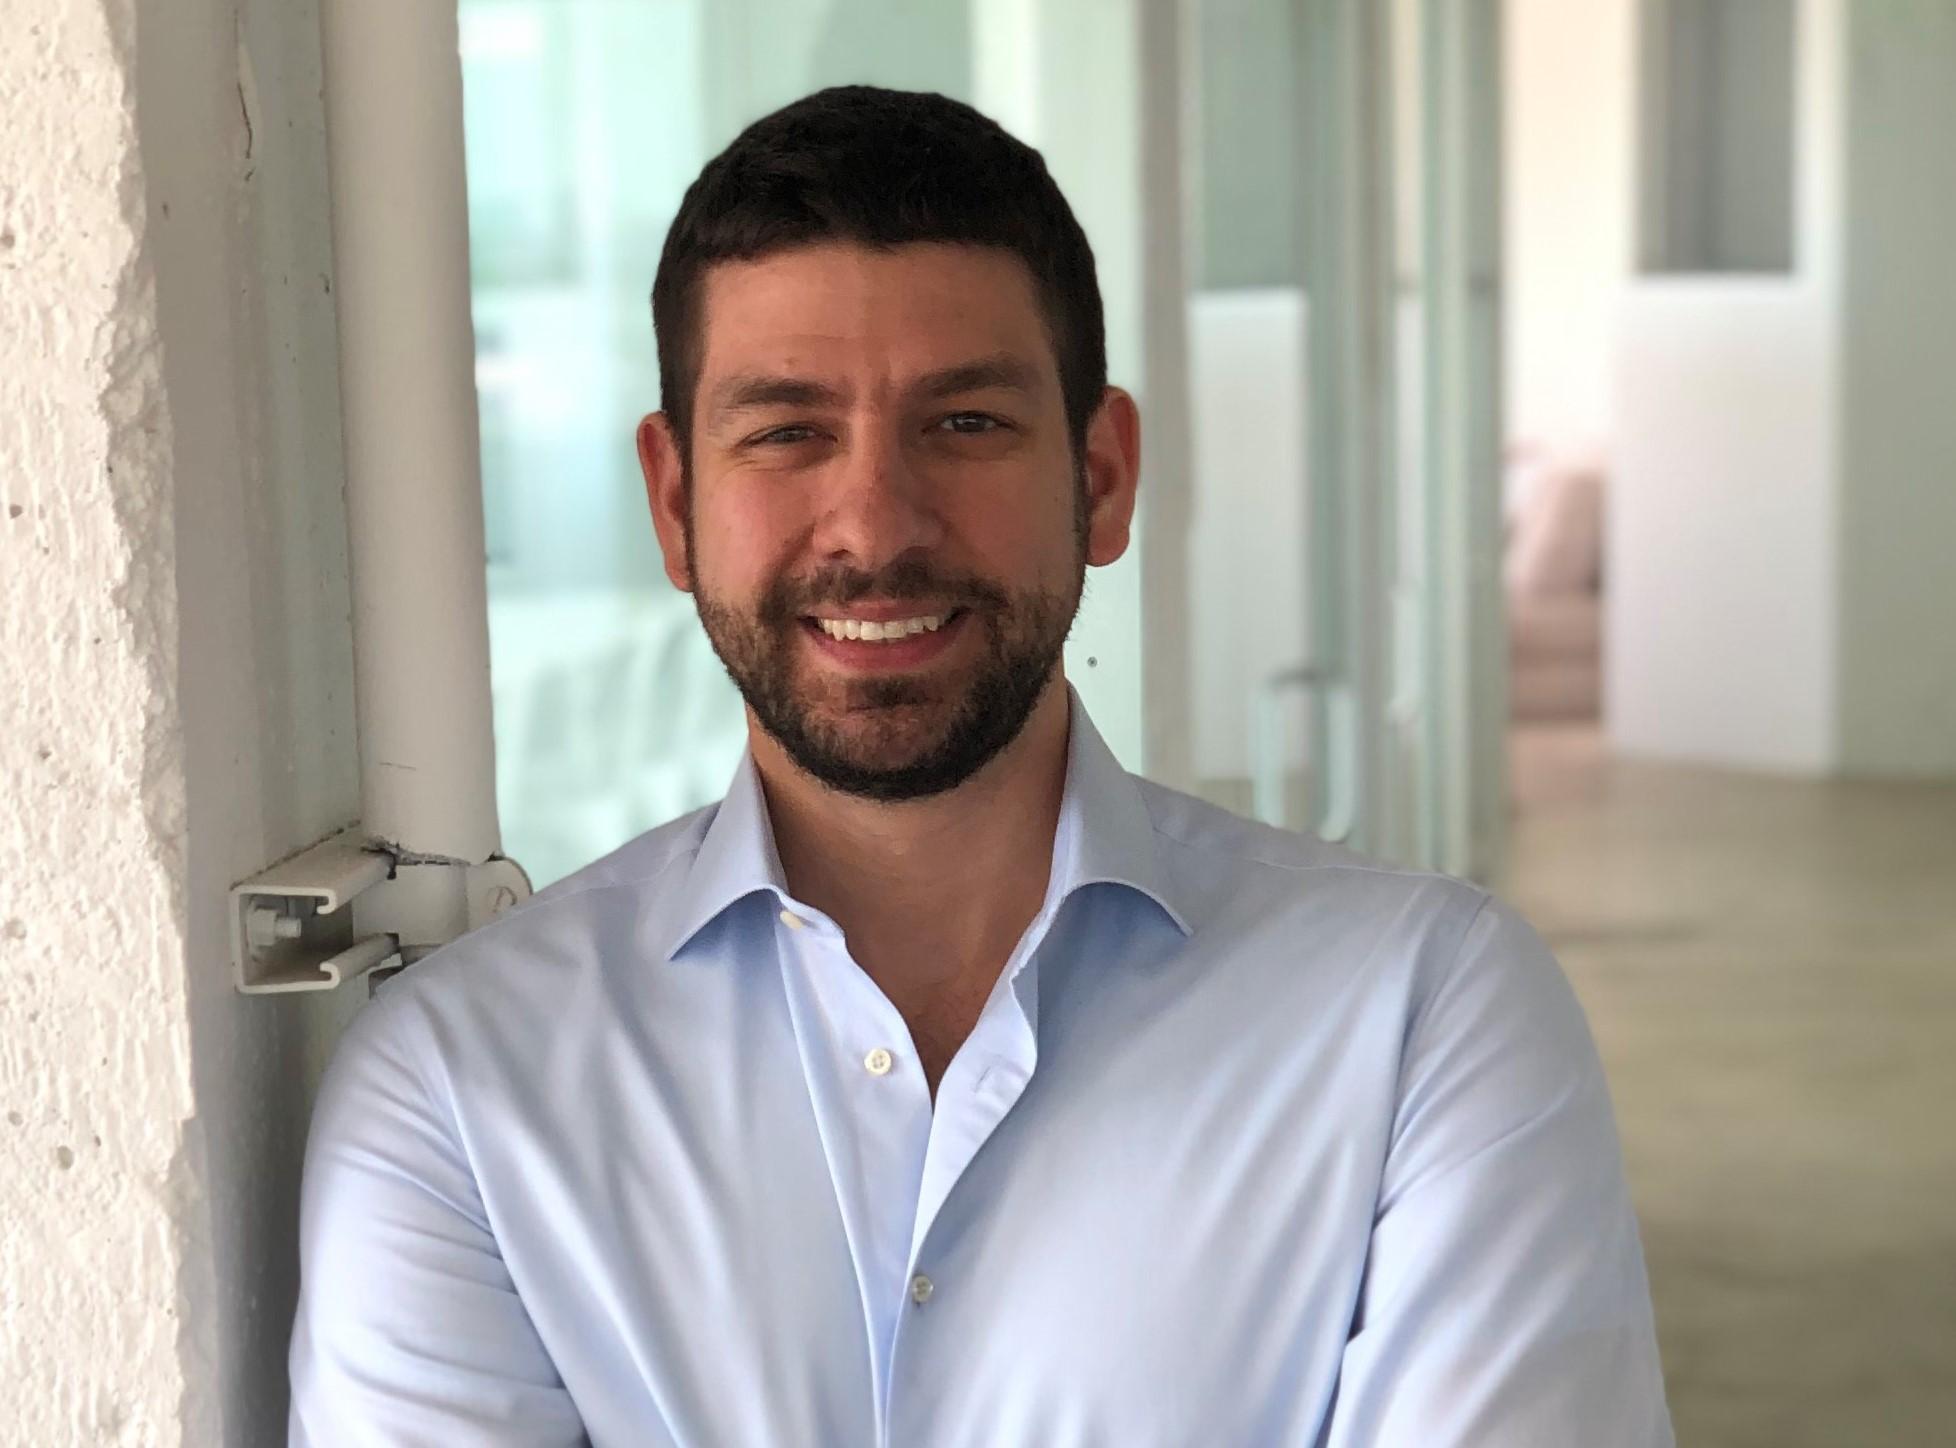 Marko Papic, Stratège en chef de Clocktower Group